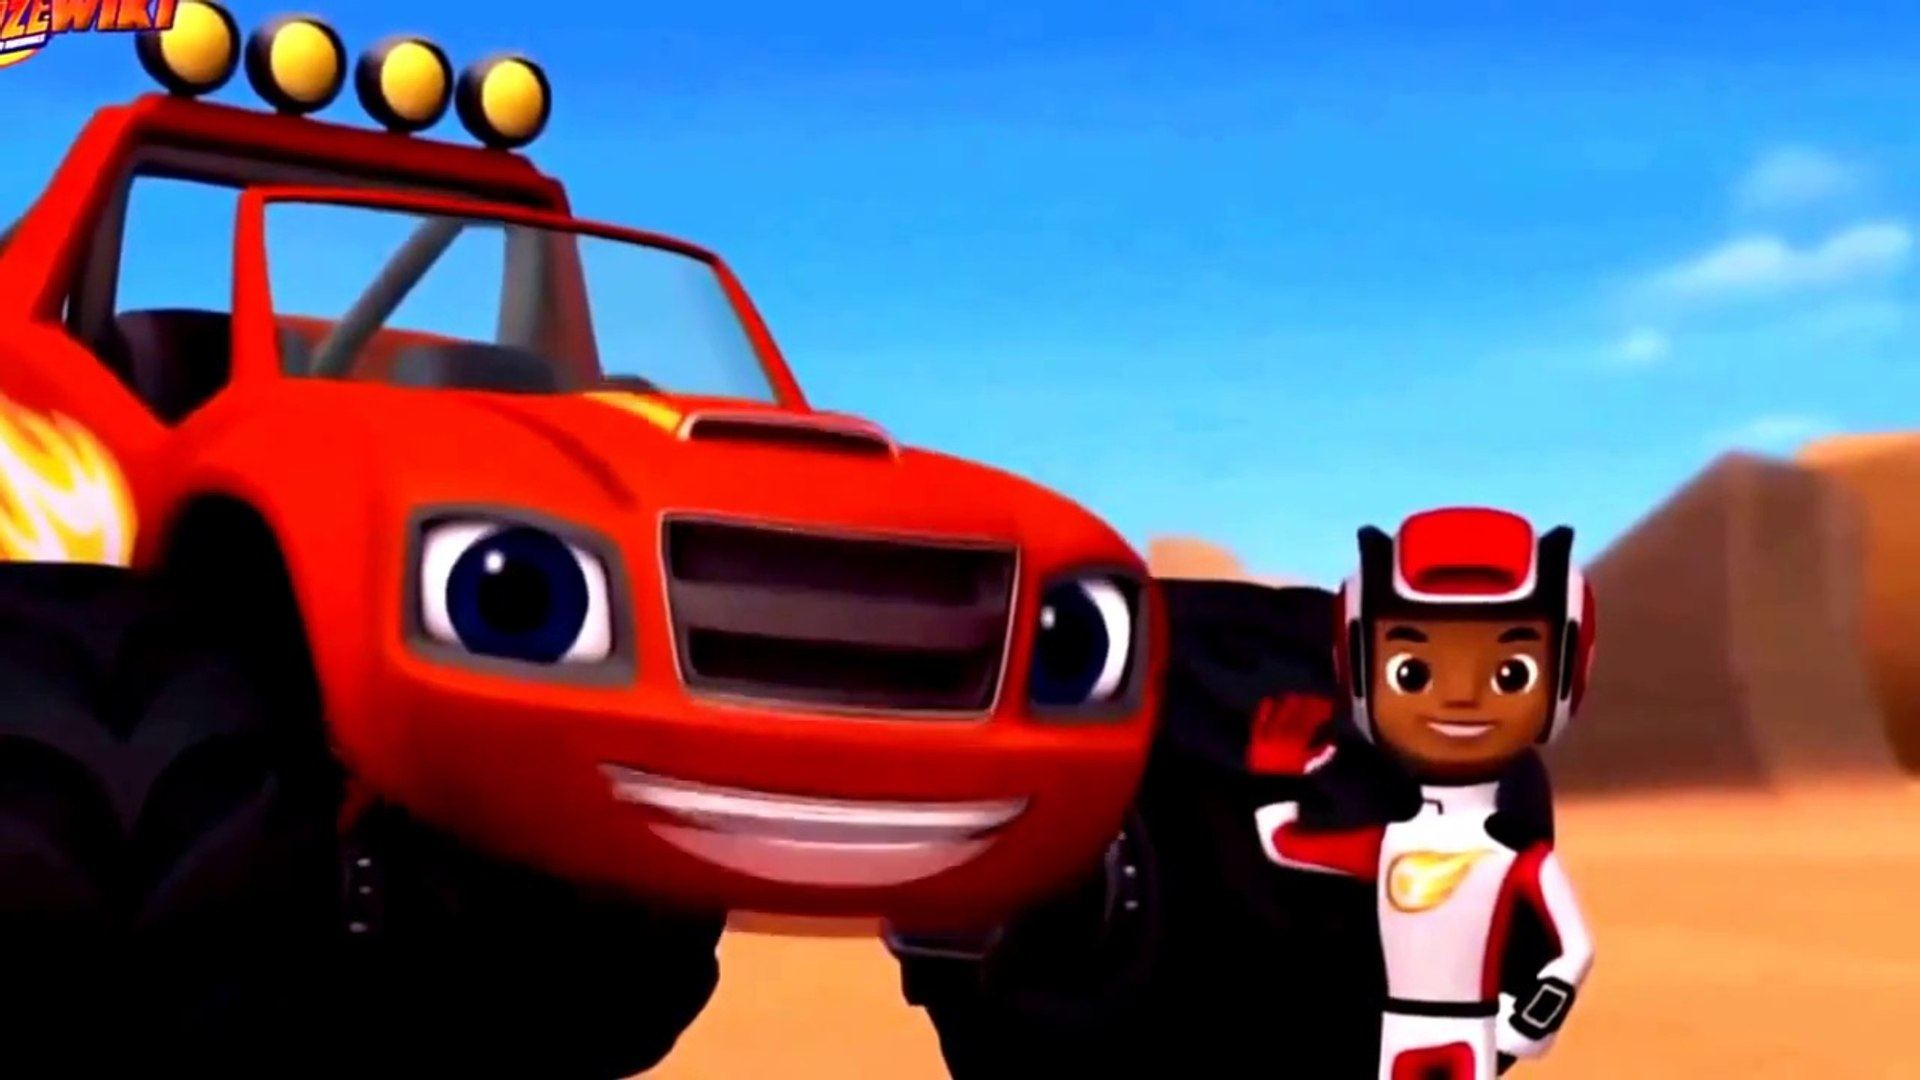 Film Kartun Mobil Truk Action Wow Seruuu Dailymotion Video